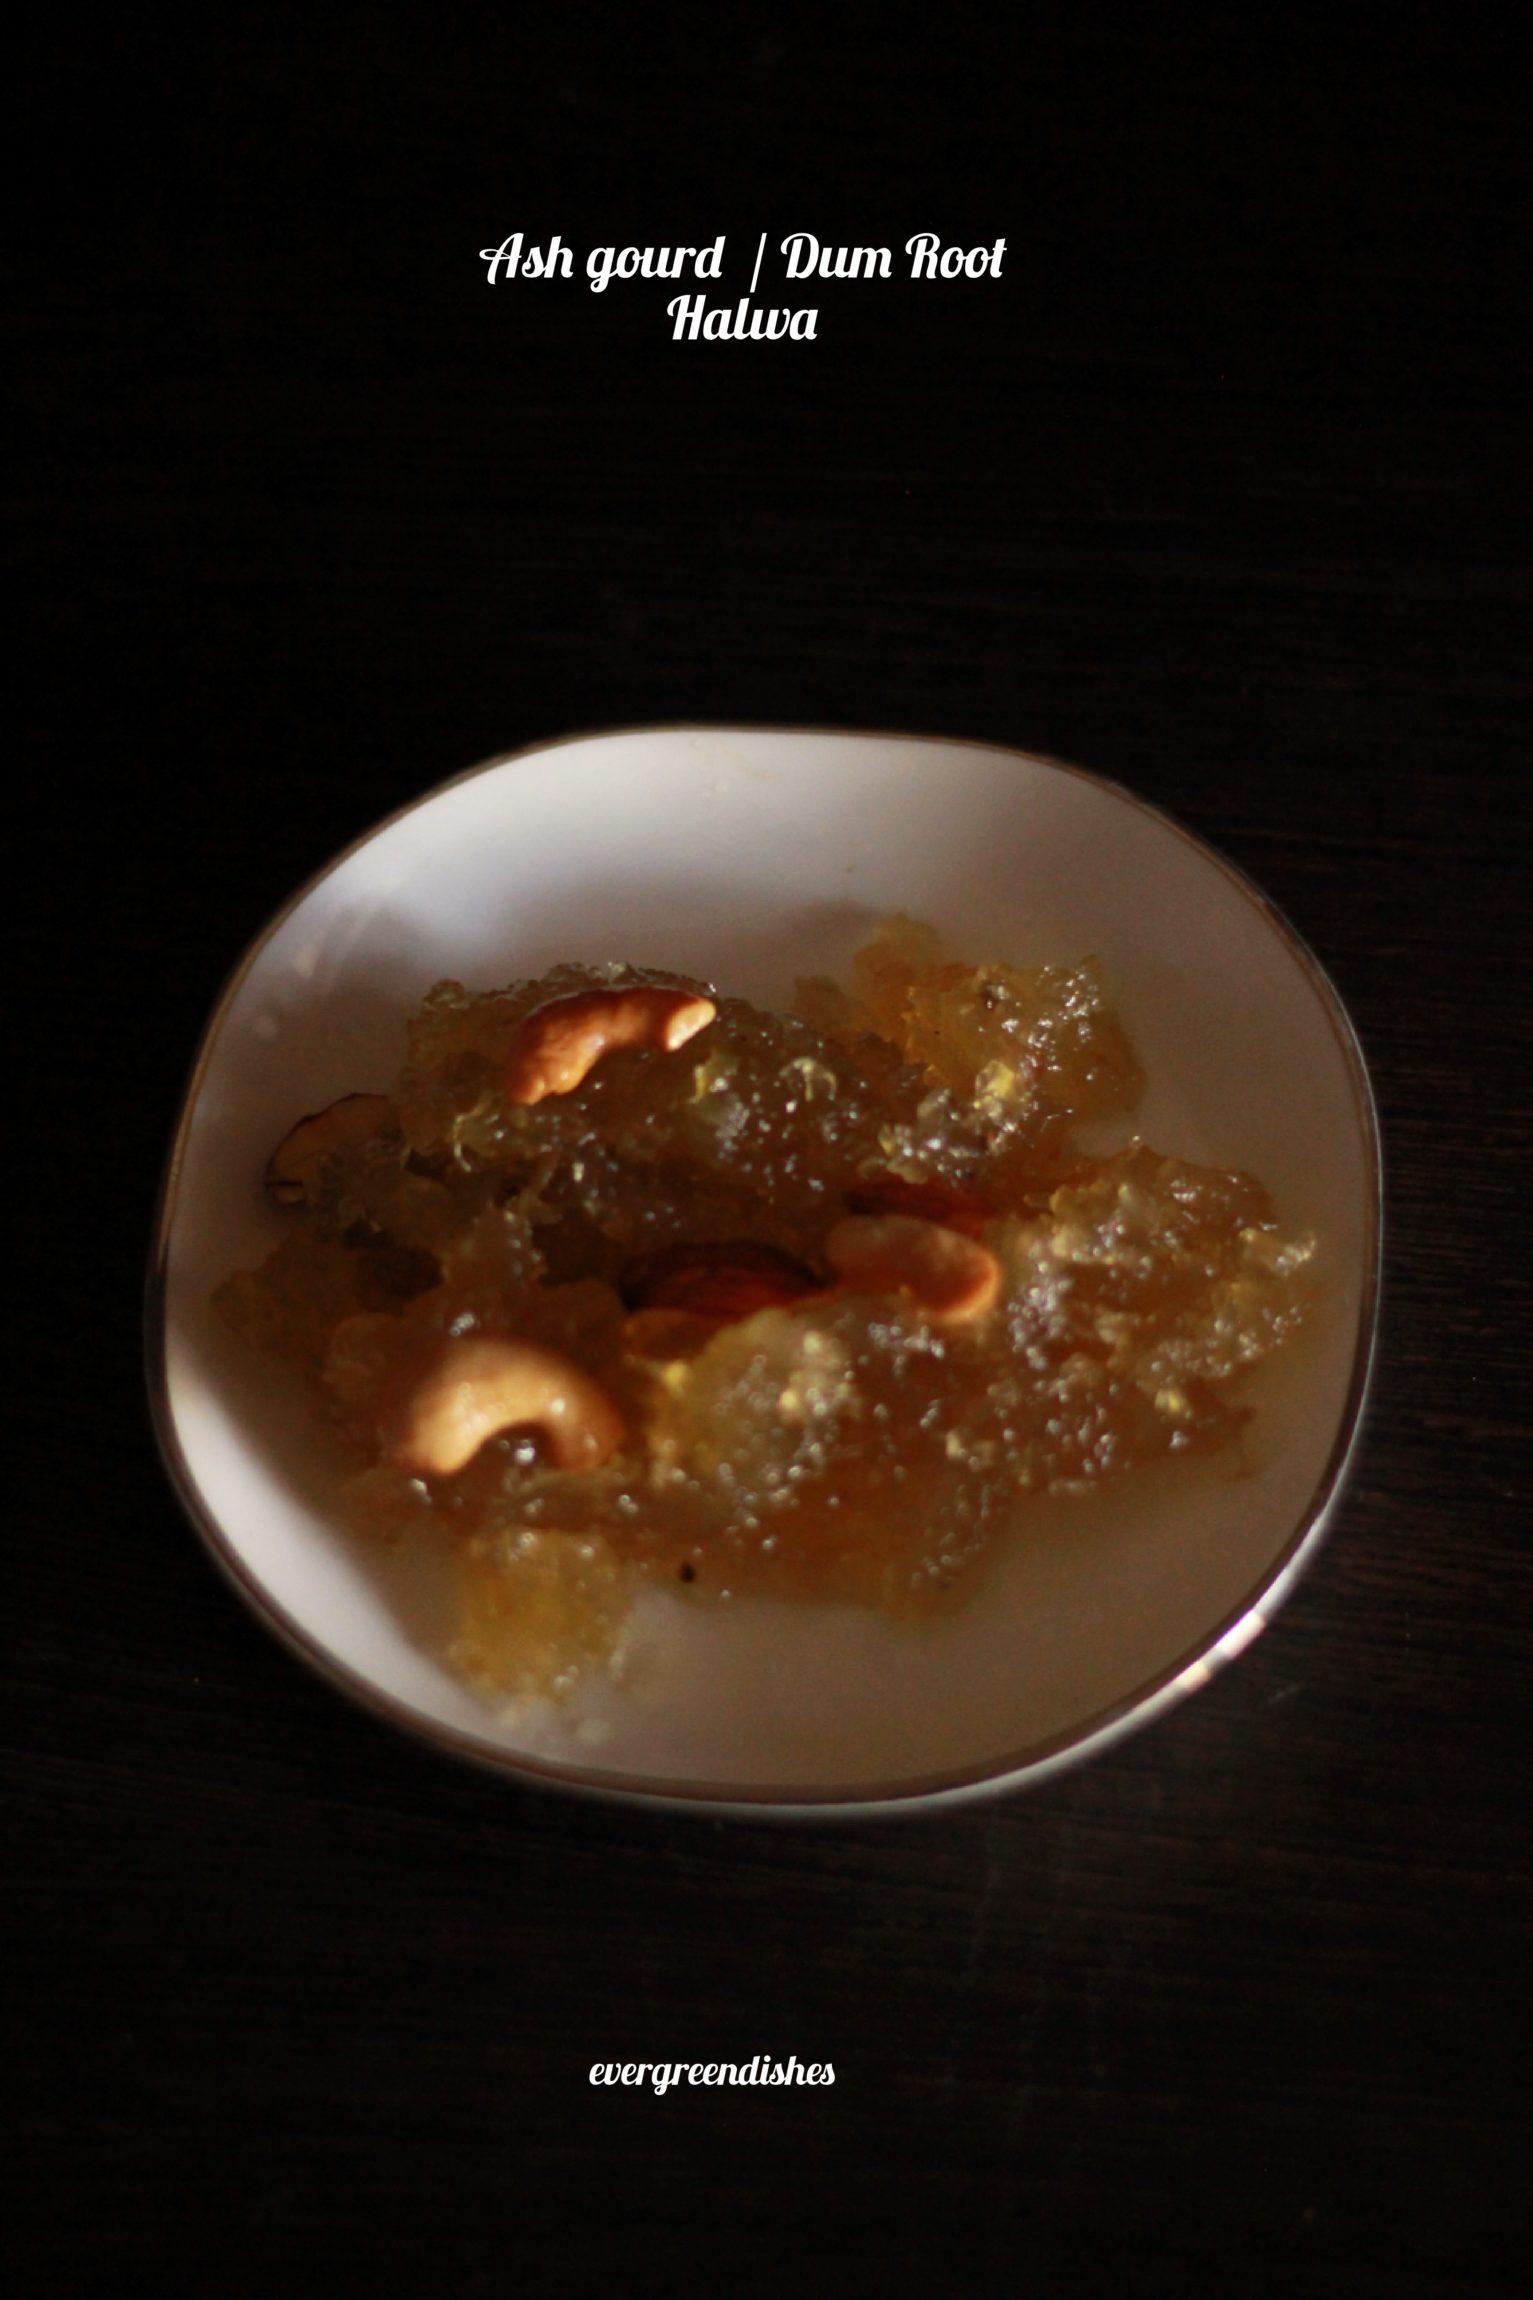 Ash gourd halwa / dum root halwa ashgourd halwa   kashi halwa   dum root halwa   budhgumbala kayi halwa Ashgourd Halwa   Kashi Halwa   Dum root Halwa   Dumroothalwa1 1533x2300